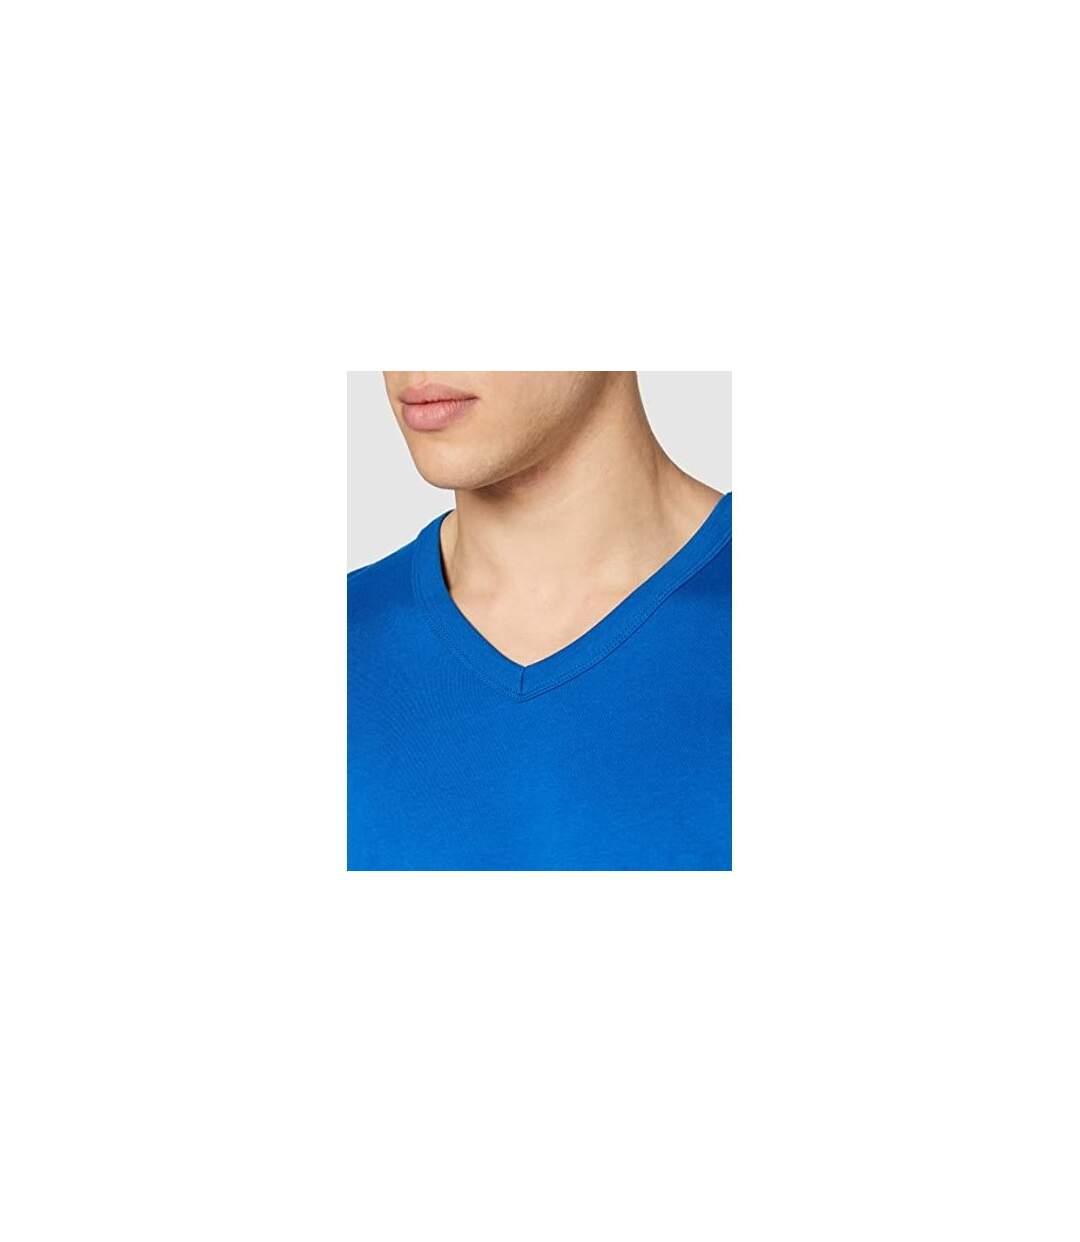 Stedman - T-shirt col V BEN - Homme (Bleu) - UTAB356